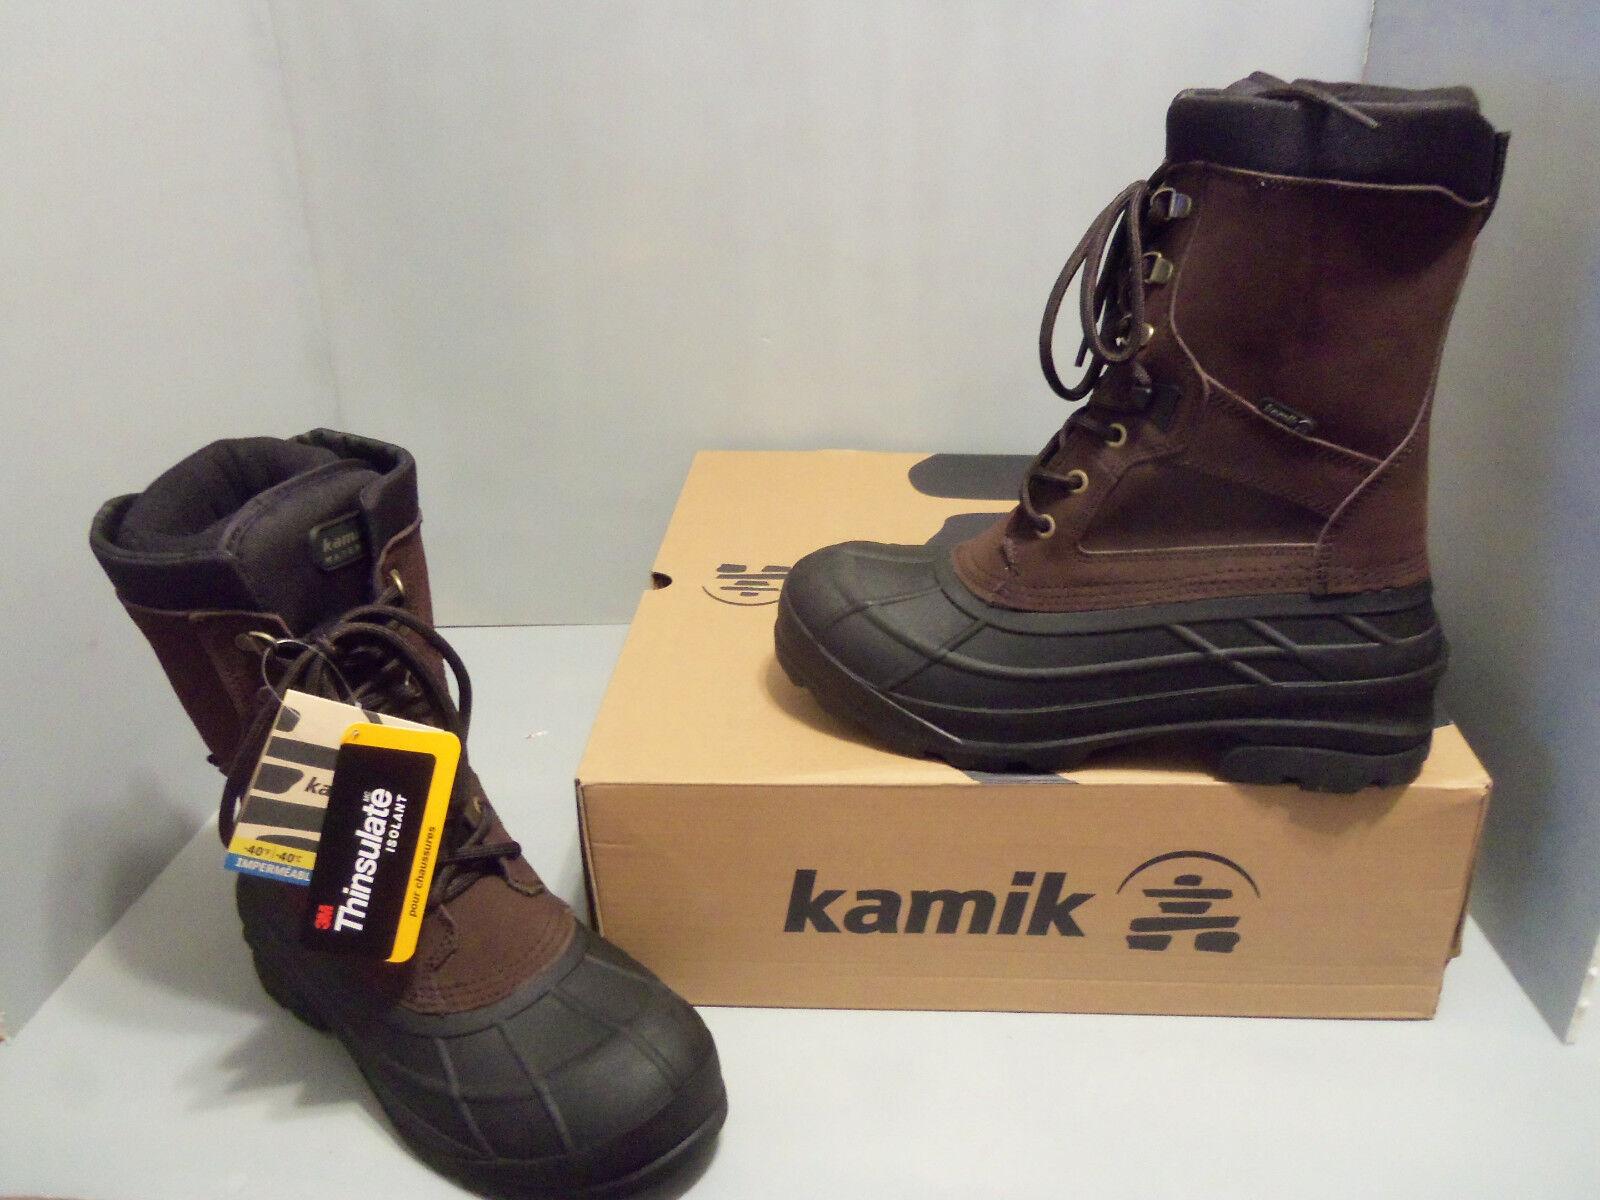 Kamik Nationwide Nation Men's Waterproof Winter Boots  SIZES NIB WK0117